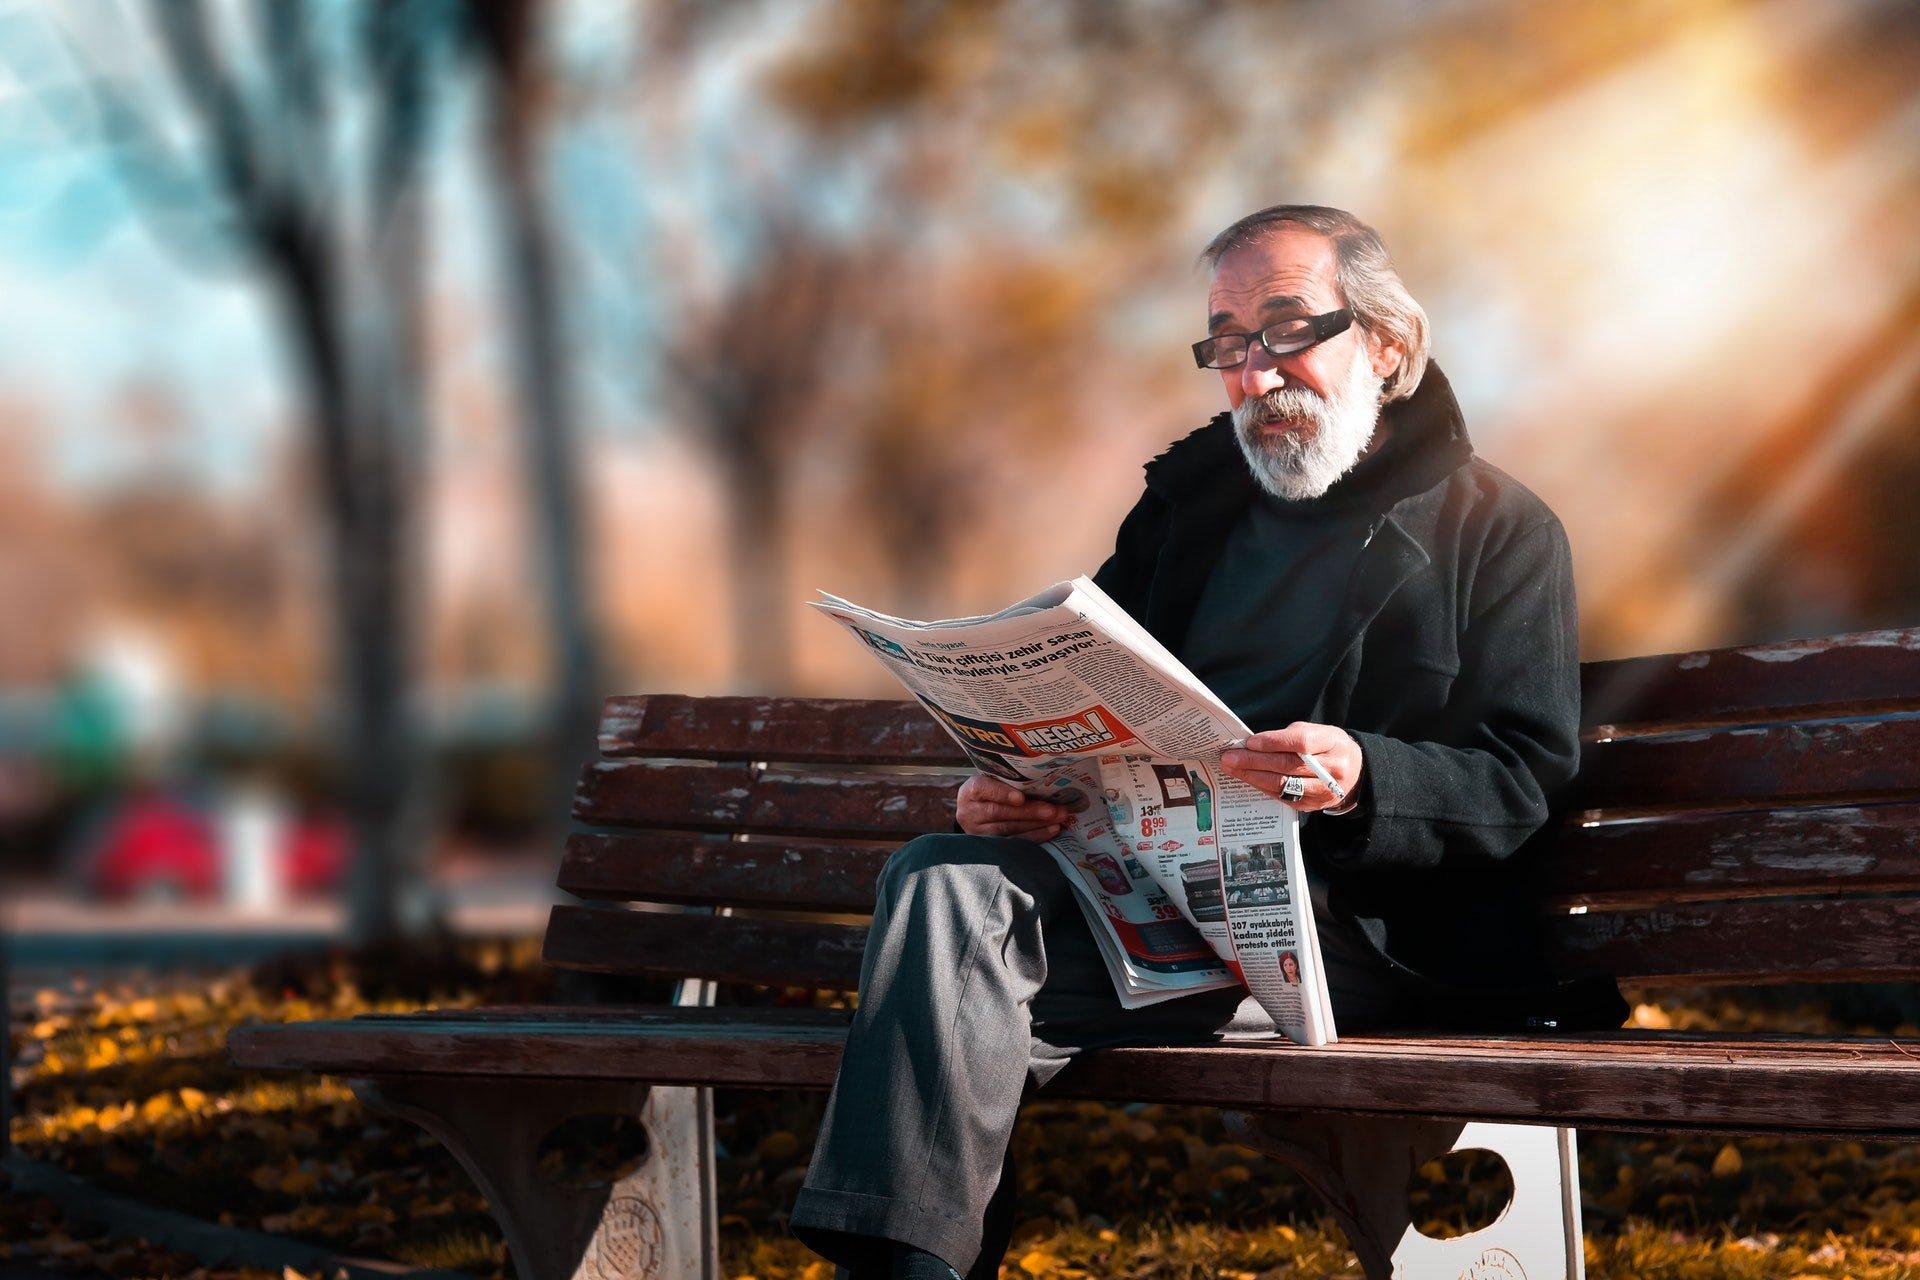 adult-bench-blur-1652340.jpg